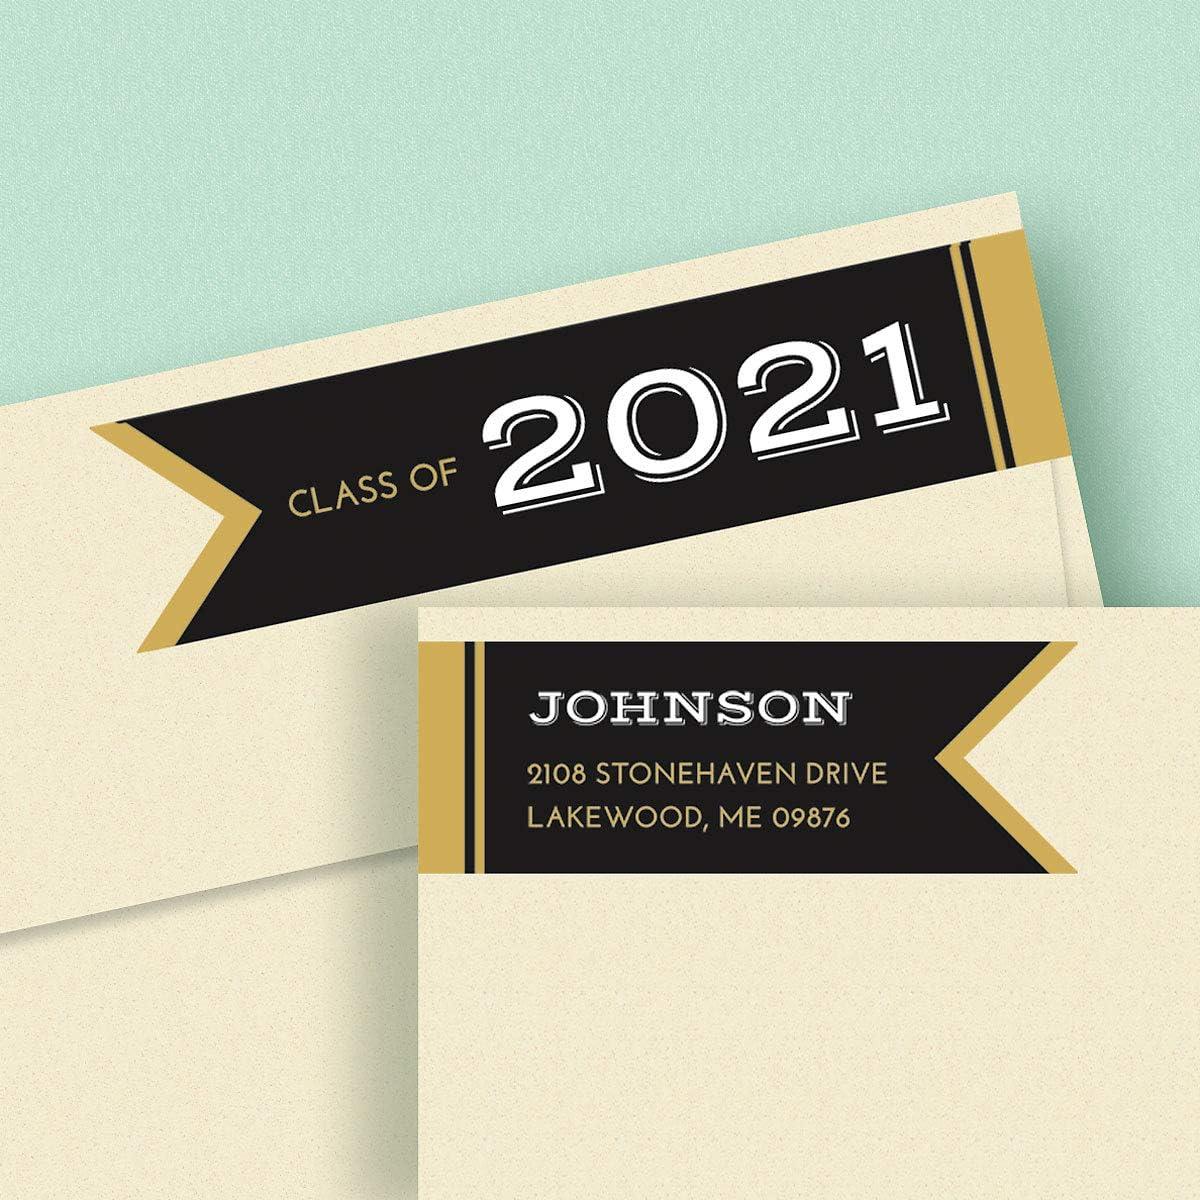 Personalized Sticker Labels Graduation Address Labels 2019 Graduation Envelope Labels Bright Future Party Supplies 30 Ct.